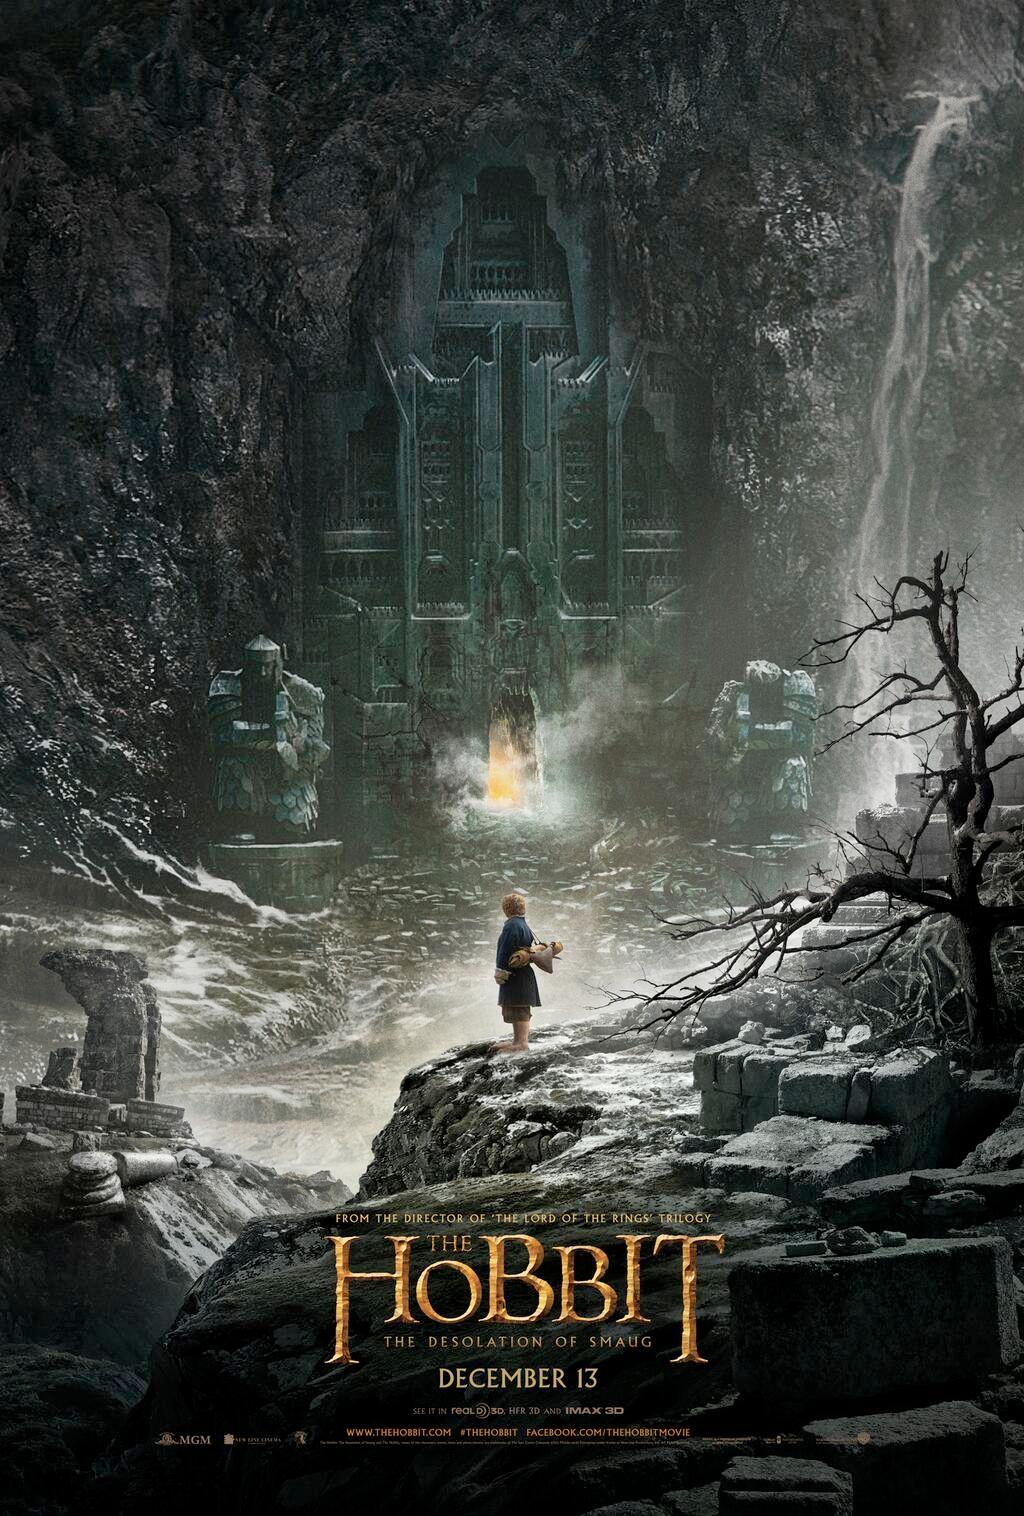 The Hobbit The Desolation of Smaug Soundtrack List